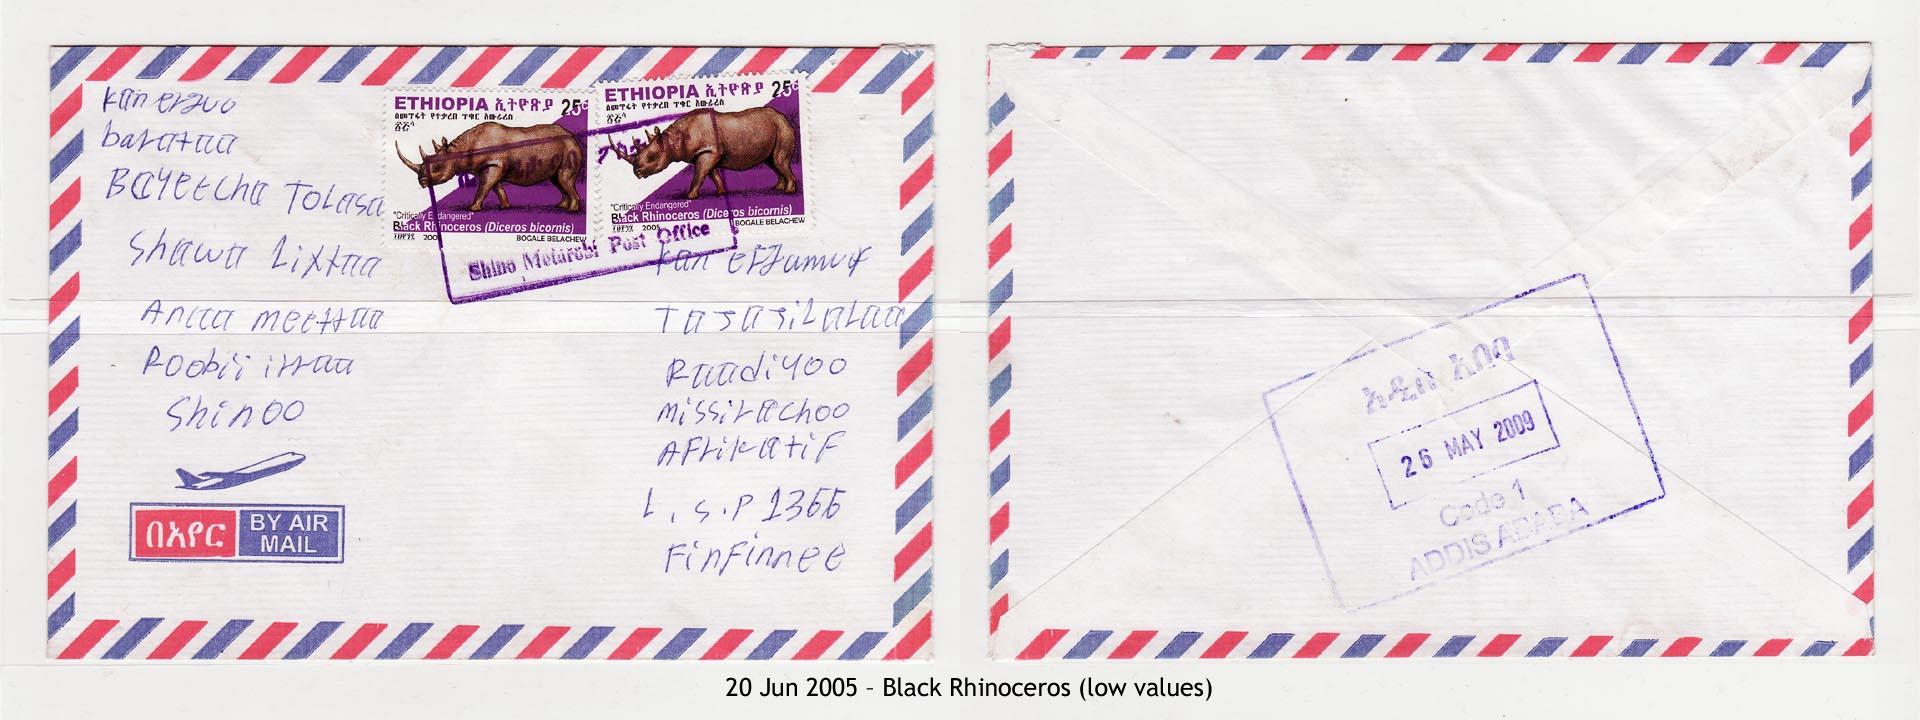 20050620 – Black Rhinoceros (low values)